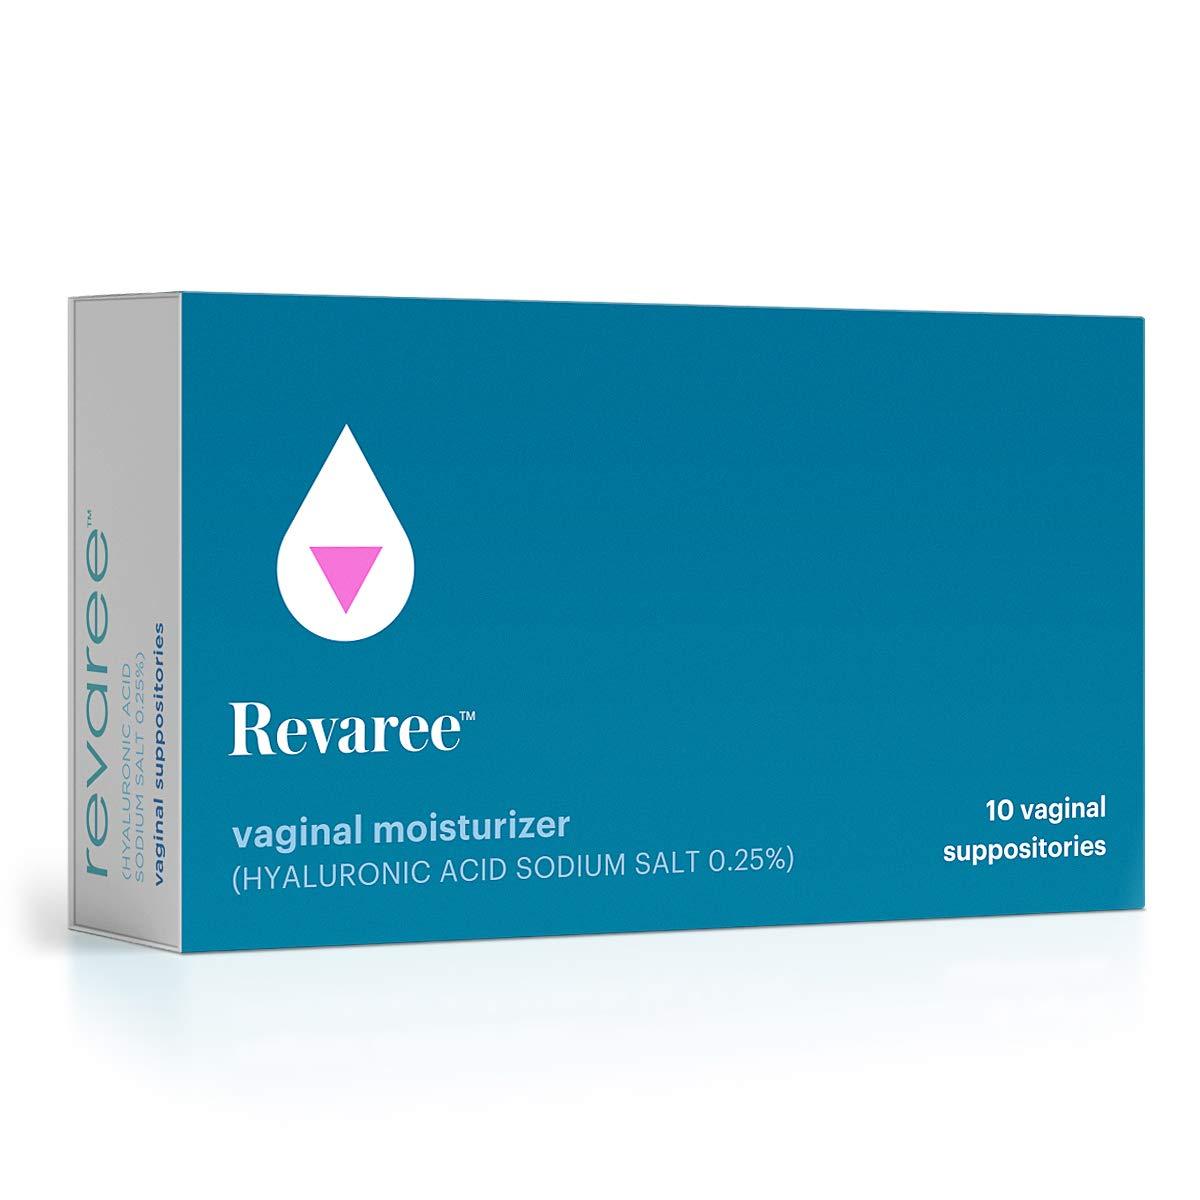 Bonafide - Revaree Hyaluronic Acid for Vaginal Dryness - Non-Hormonal, Paraben-Free (10 Vaginal Inserts) by Revaree